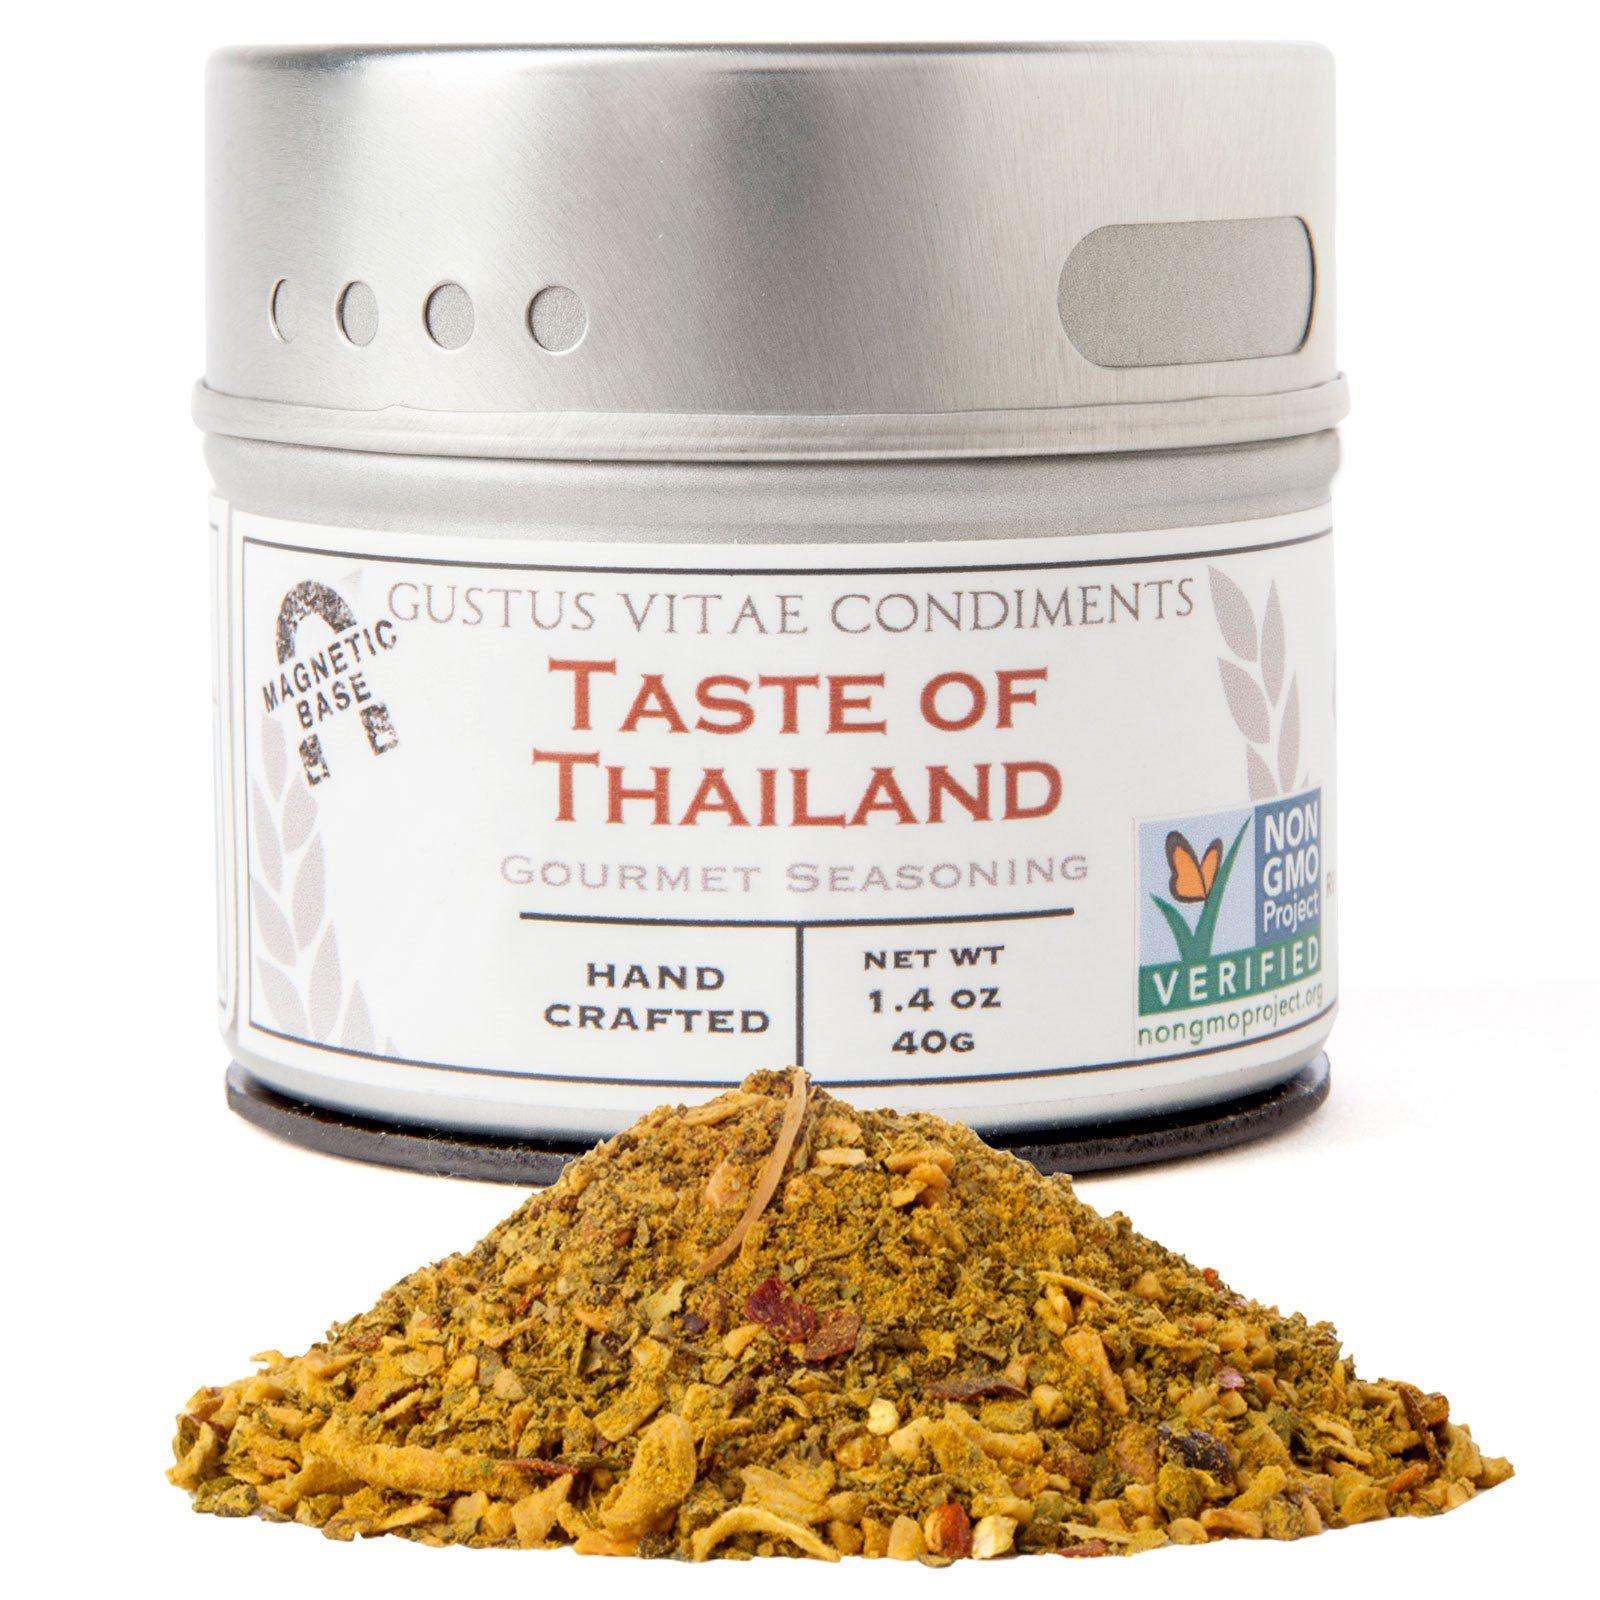 Gustus Vitae, Condiments, Изысканная приправа, вкус Таиланда, 1.4 унций (40 г)